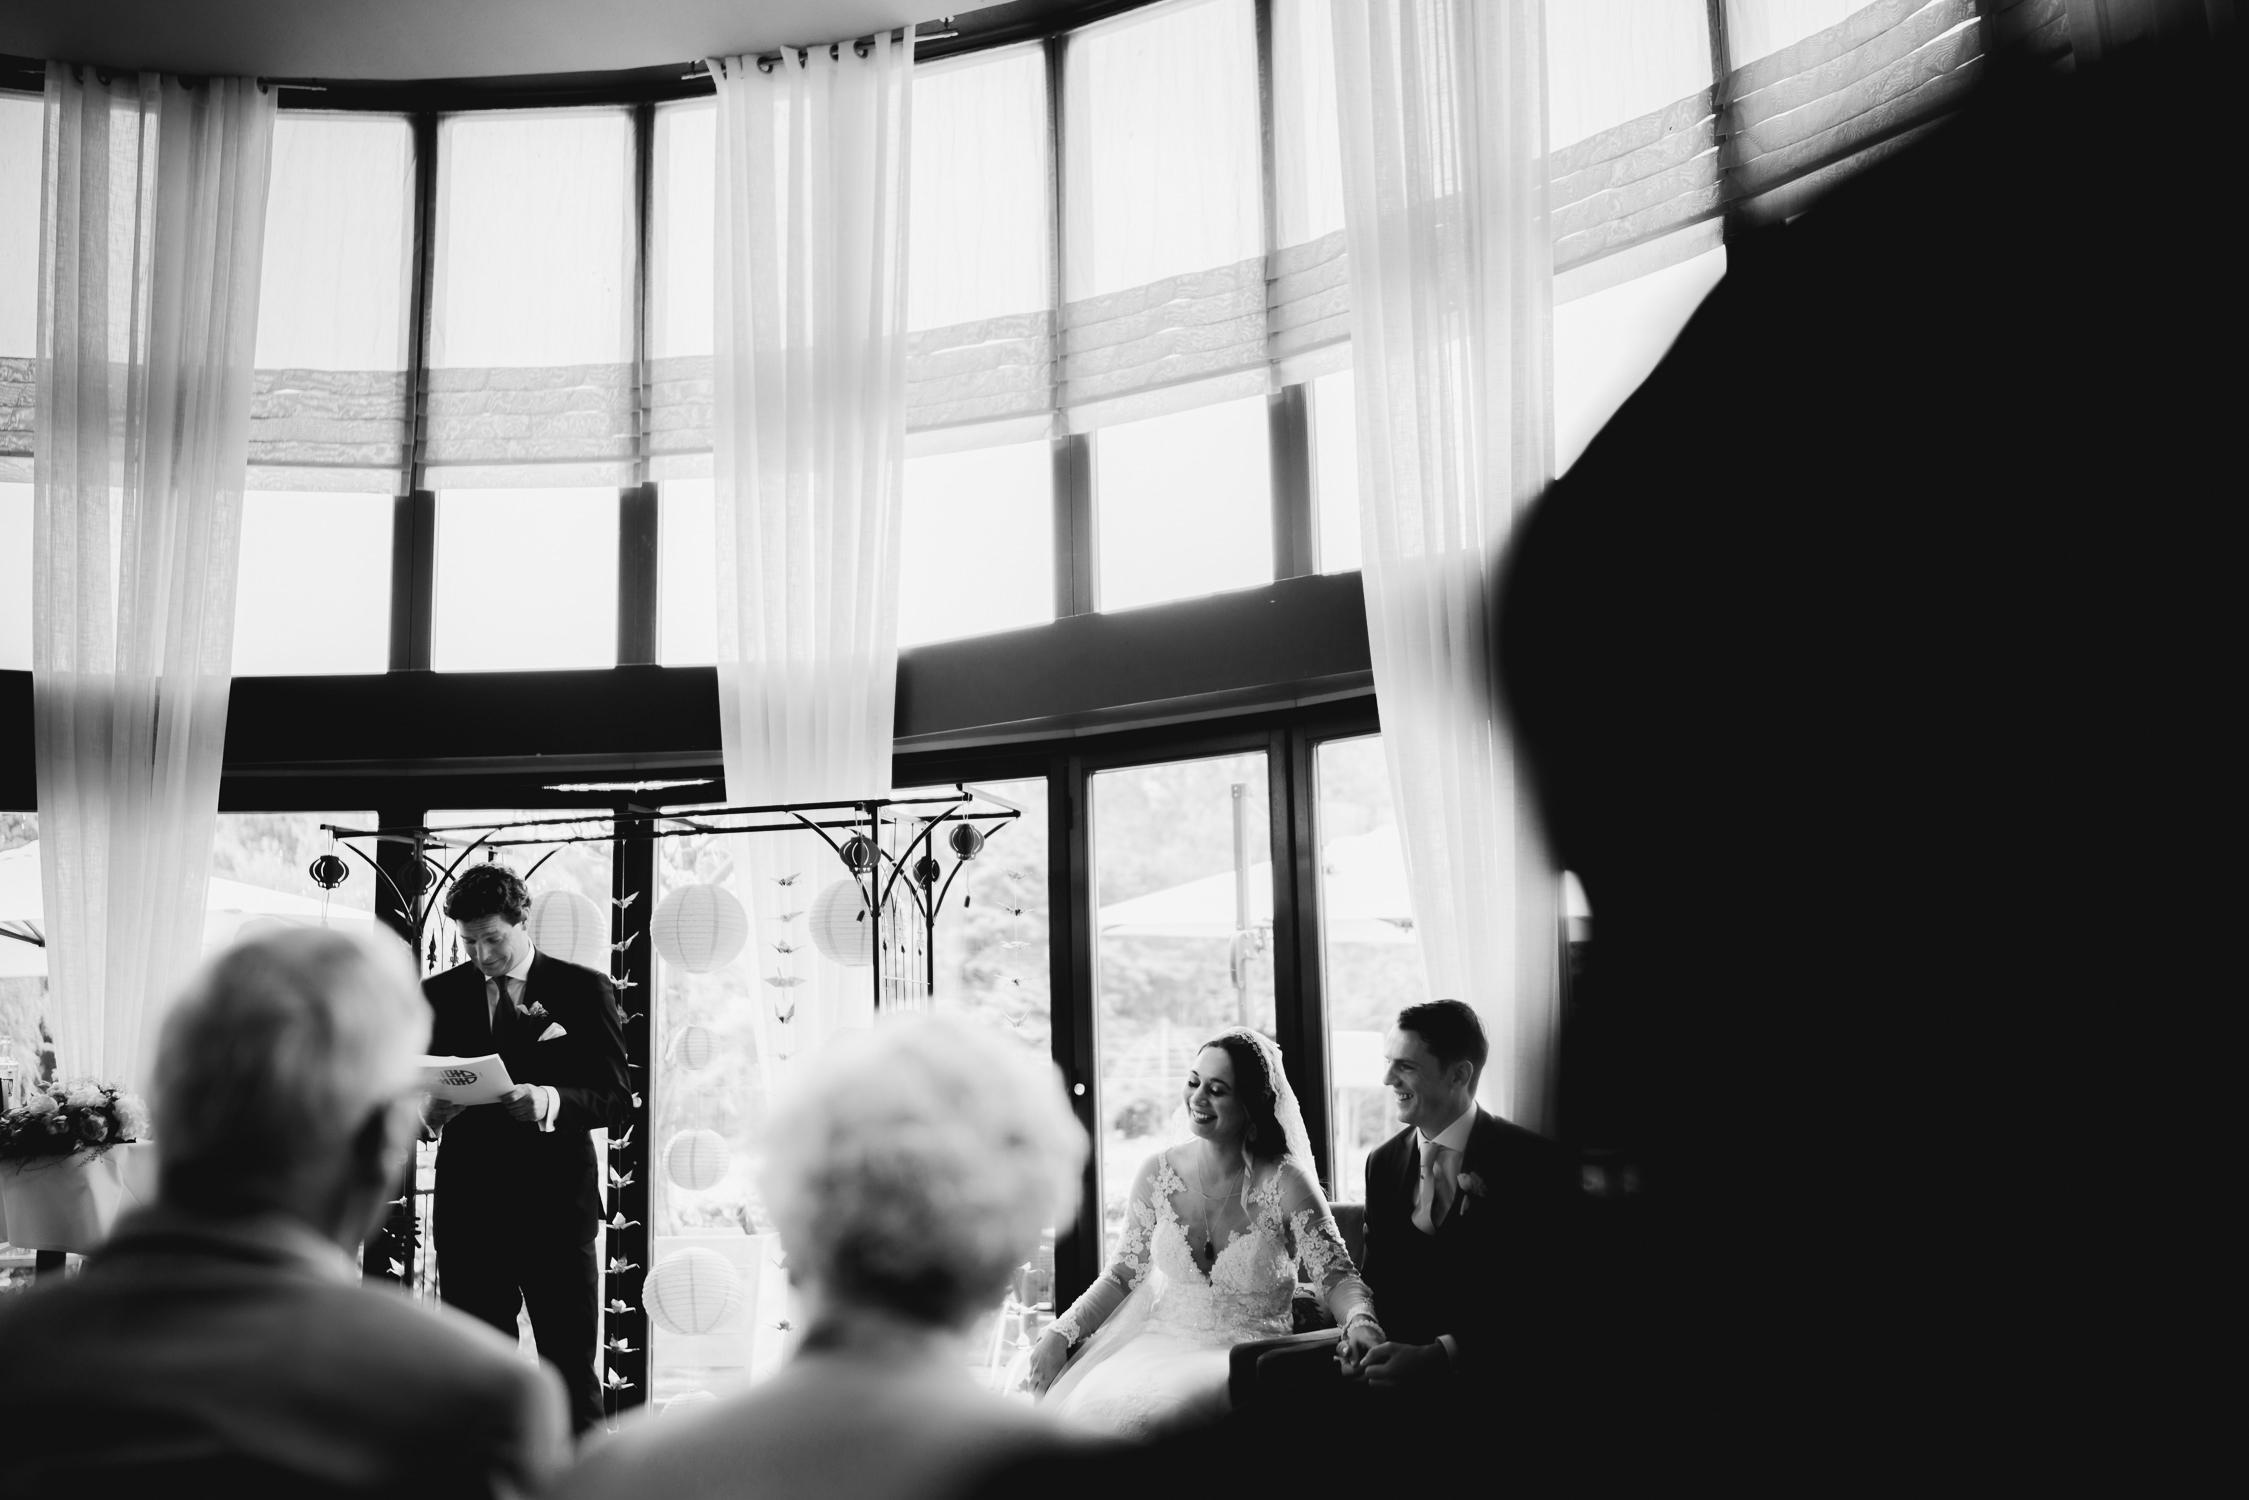 bruidsfotografie-amsterdam-utrecht-trouwfotograaf-mark-hadden-wedding-photography-Robin & Guus-176-2.jpg